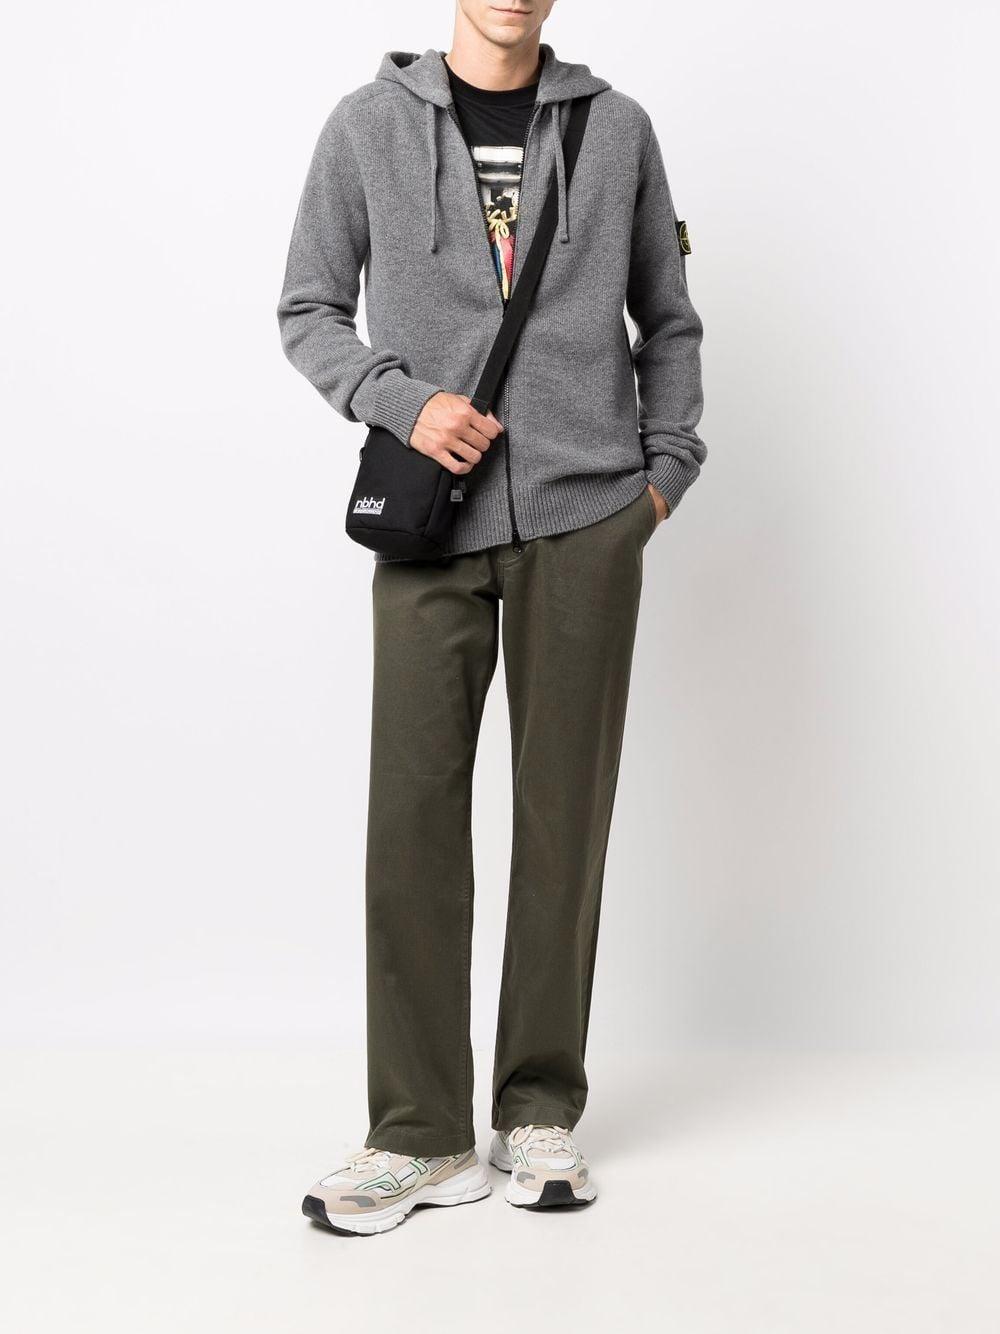 Grey wool hoodie featuring Stone Island logo patch STONE ISLAND |  | 7515546A3V0060